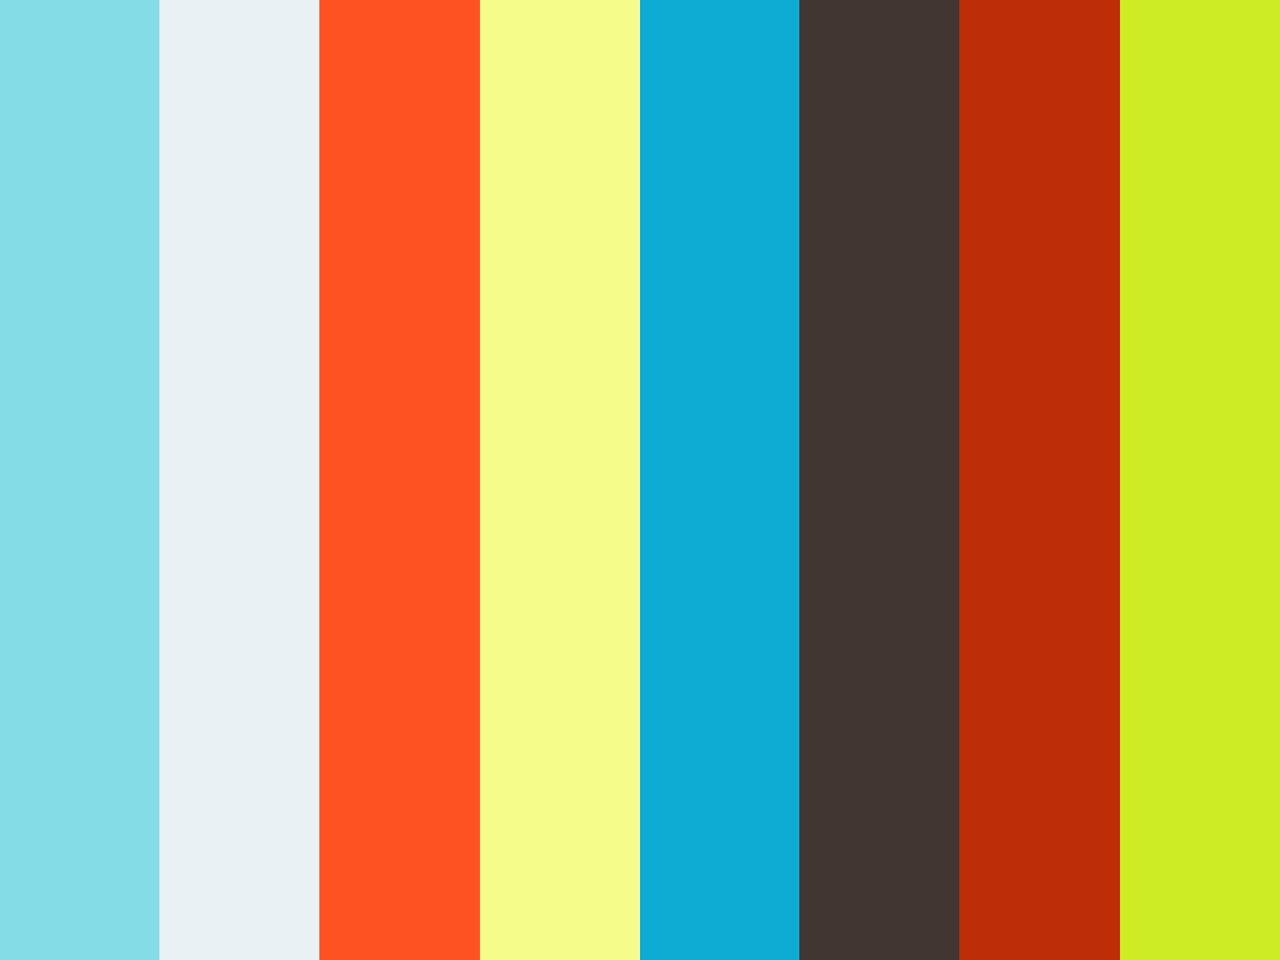 Loop - by Rachel Aka, Cameron Van Buren, Emmanuel Lapoterie, and Thato Lehoko